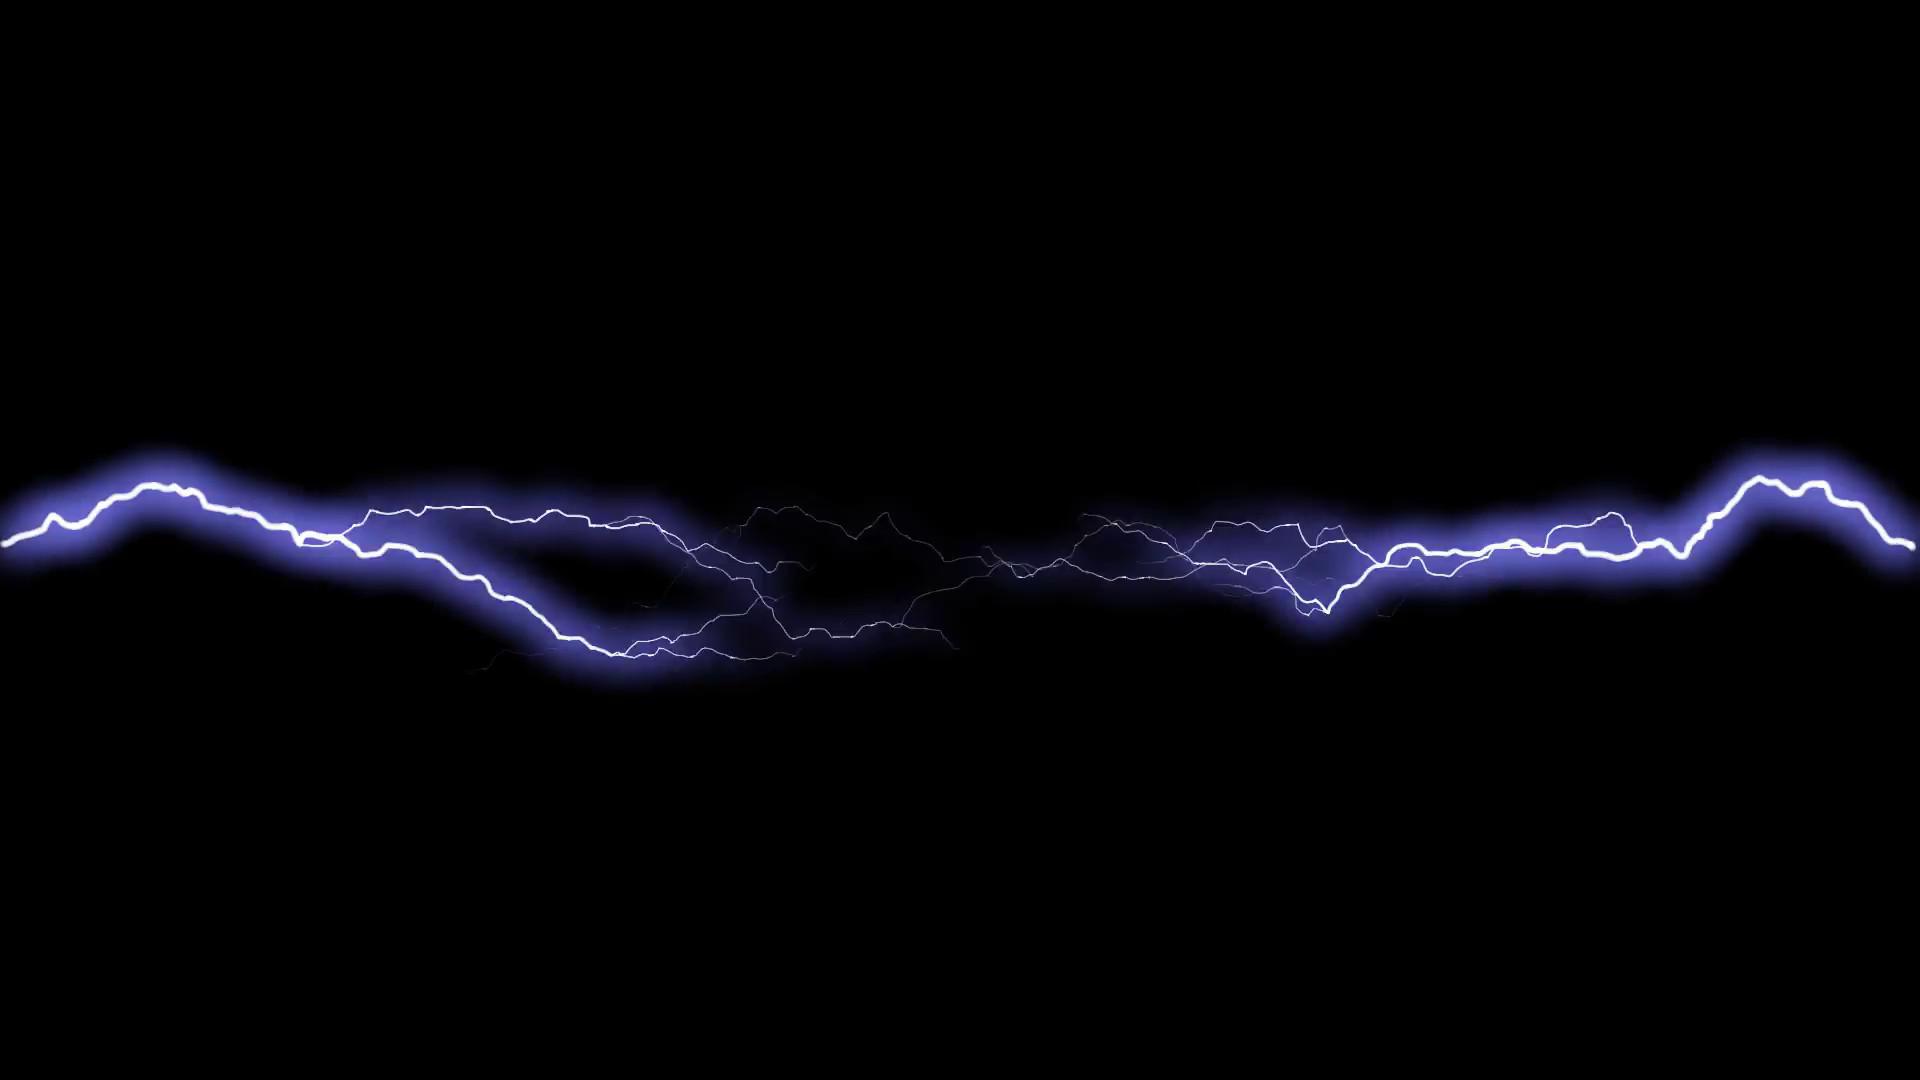 Rog Animated Wallpaper Lightning Bolt Background 43 Pictures